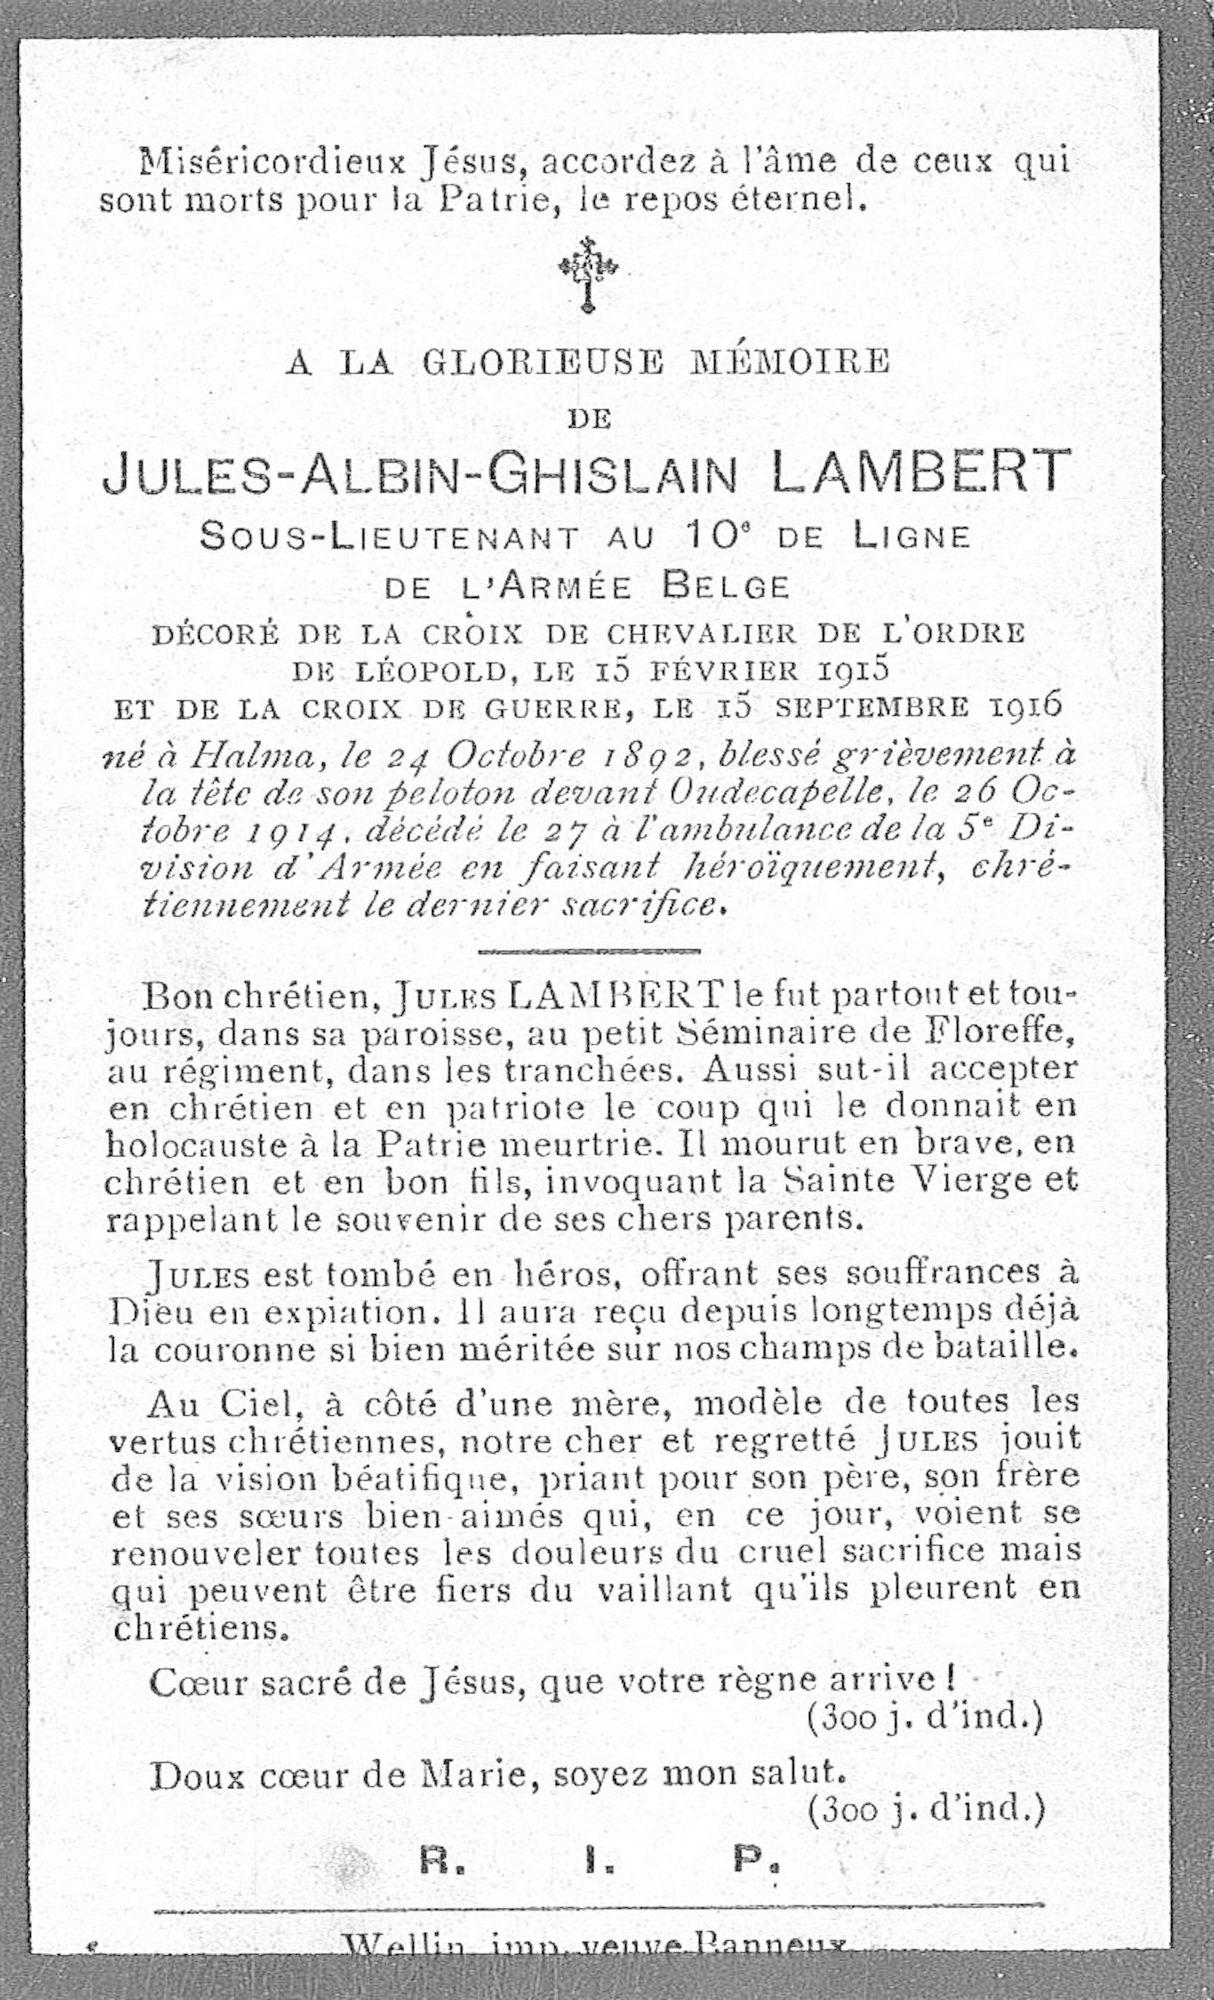 Lambert Jules-Albin-Ghislain